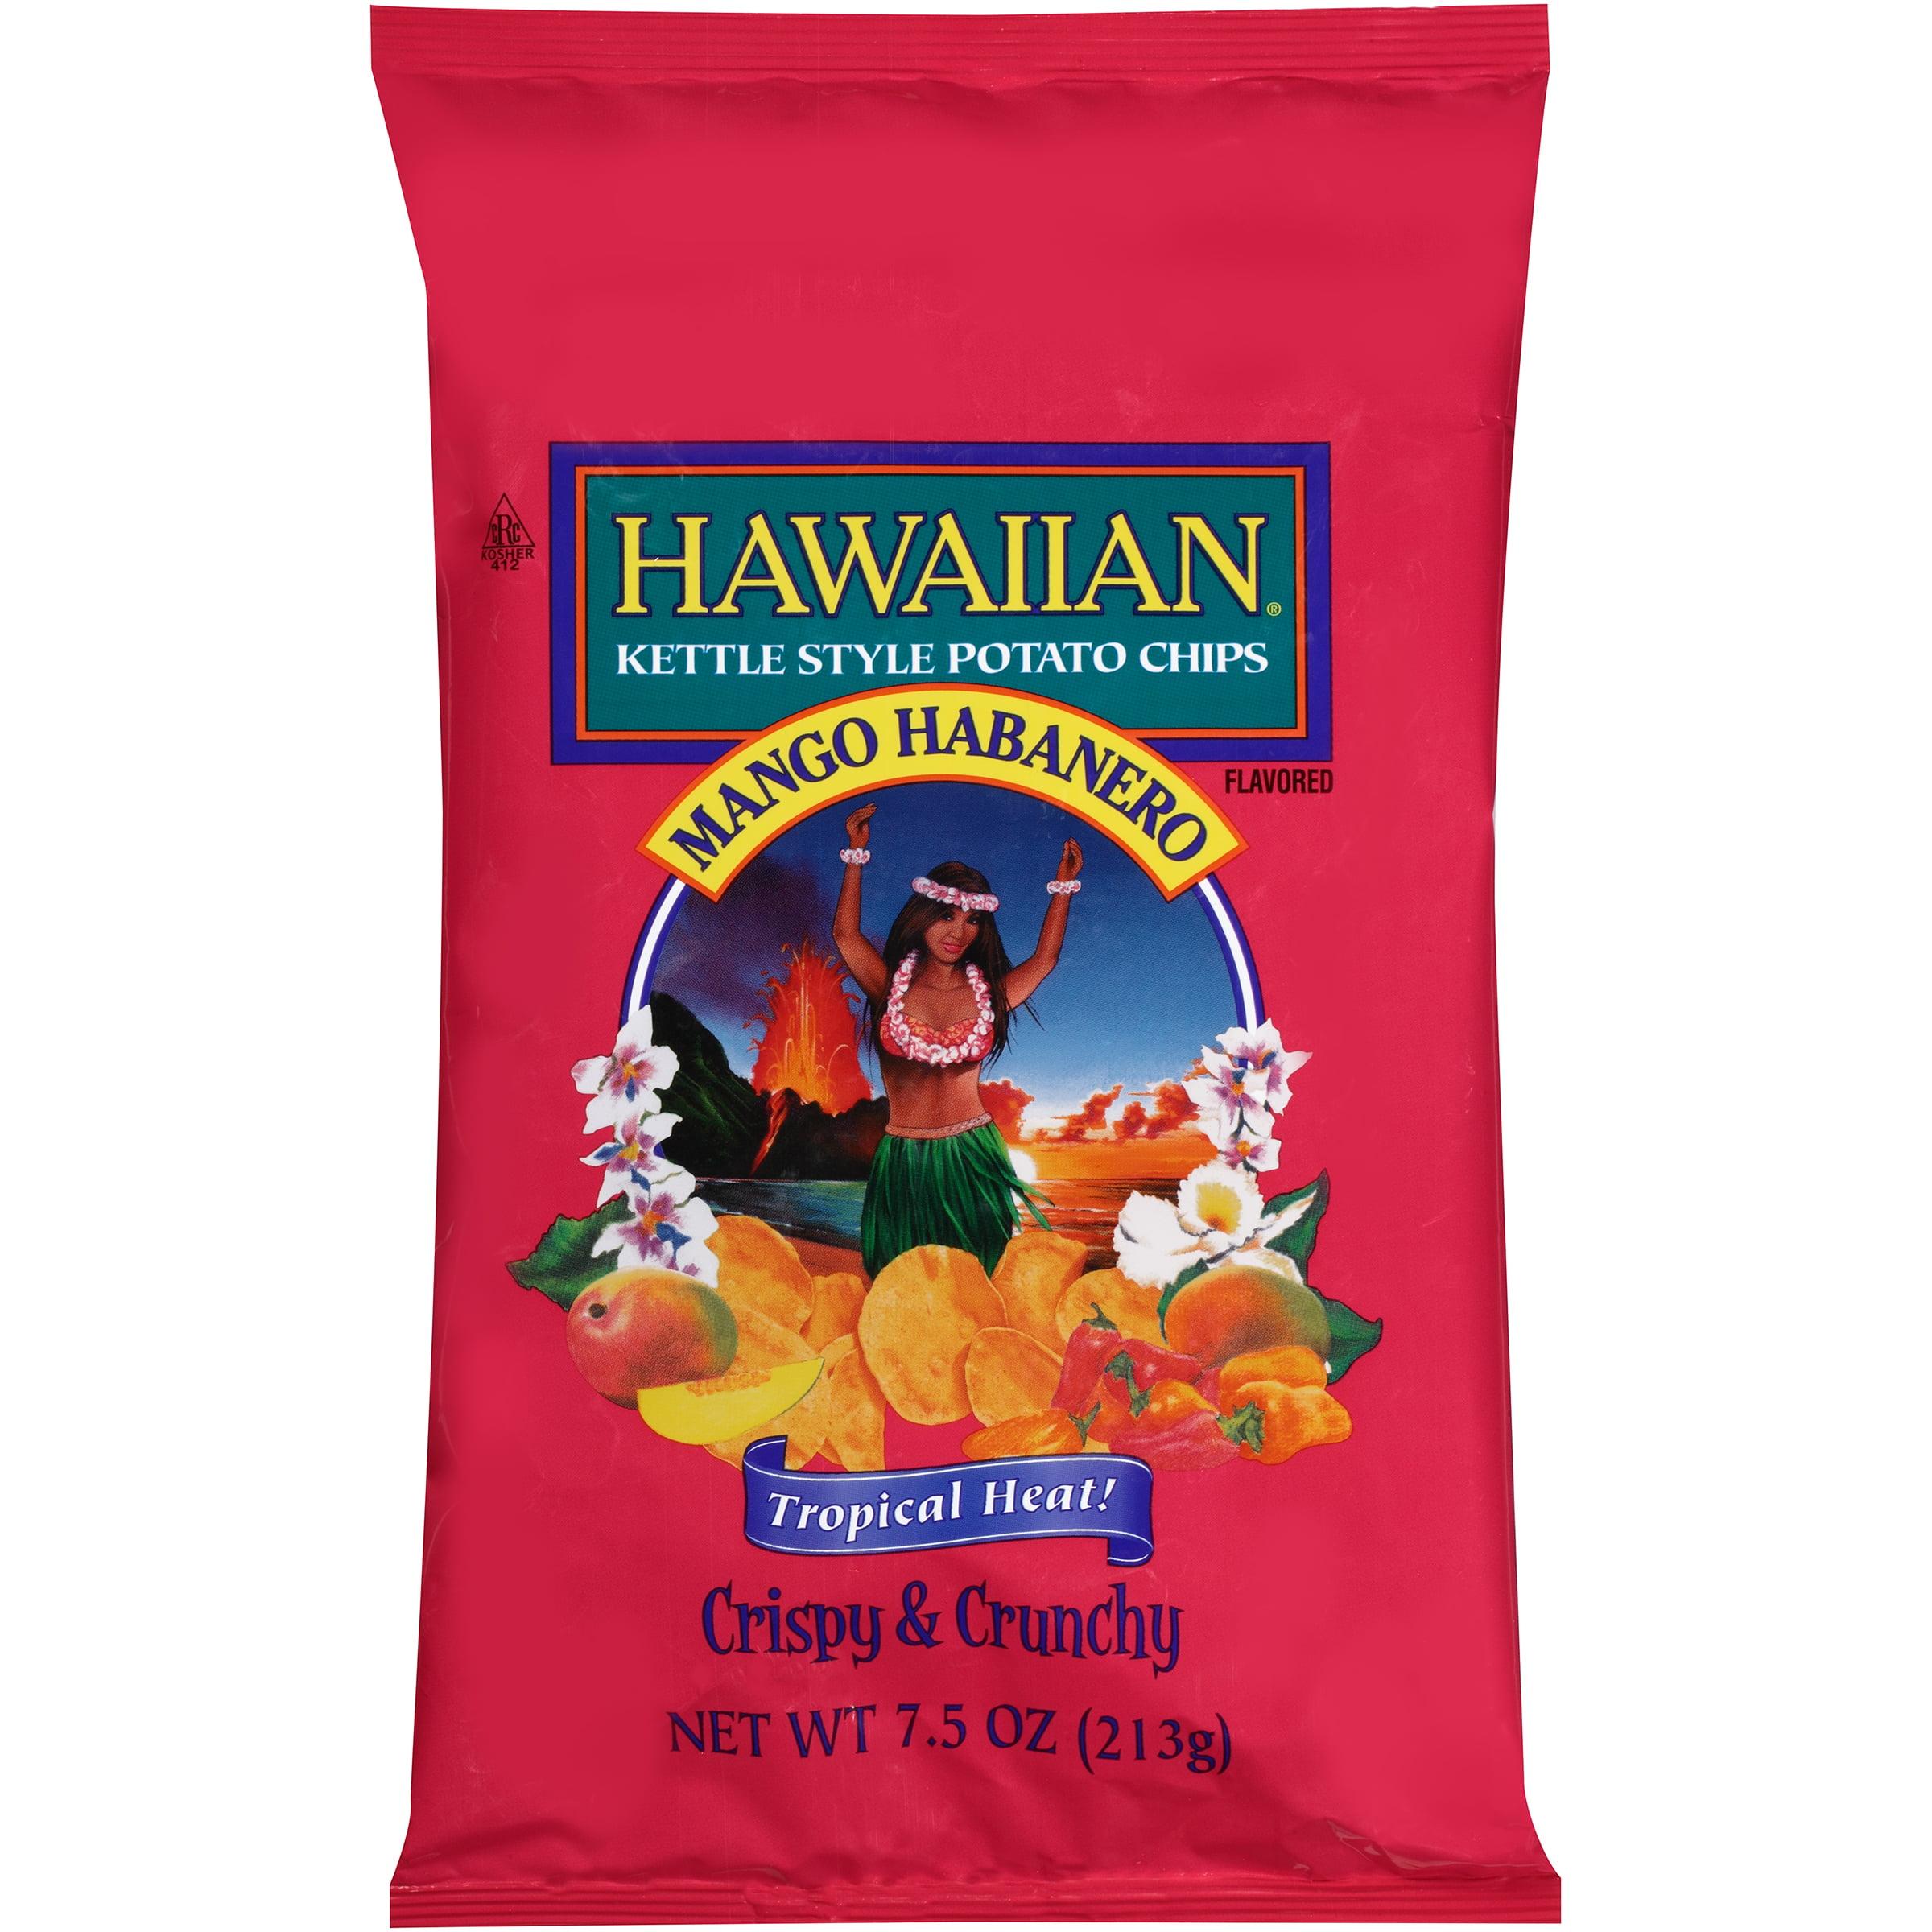 Hawaiian�� Kettle Style Potato Chips Mango Habanero Flavored 7.5 oz. Bag